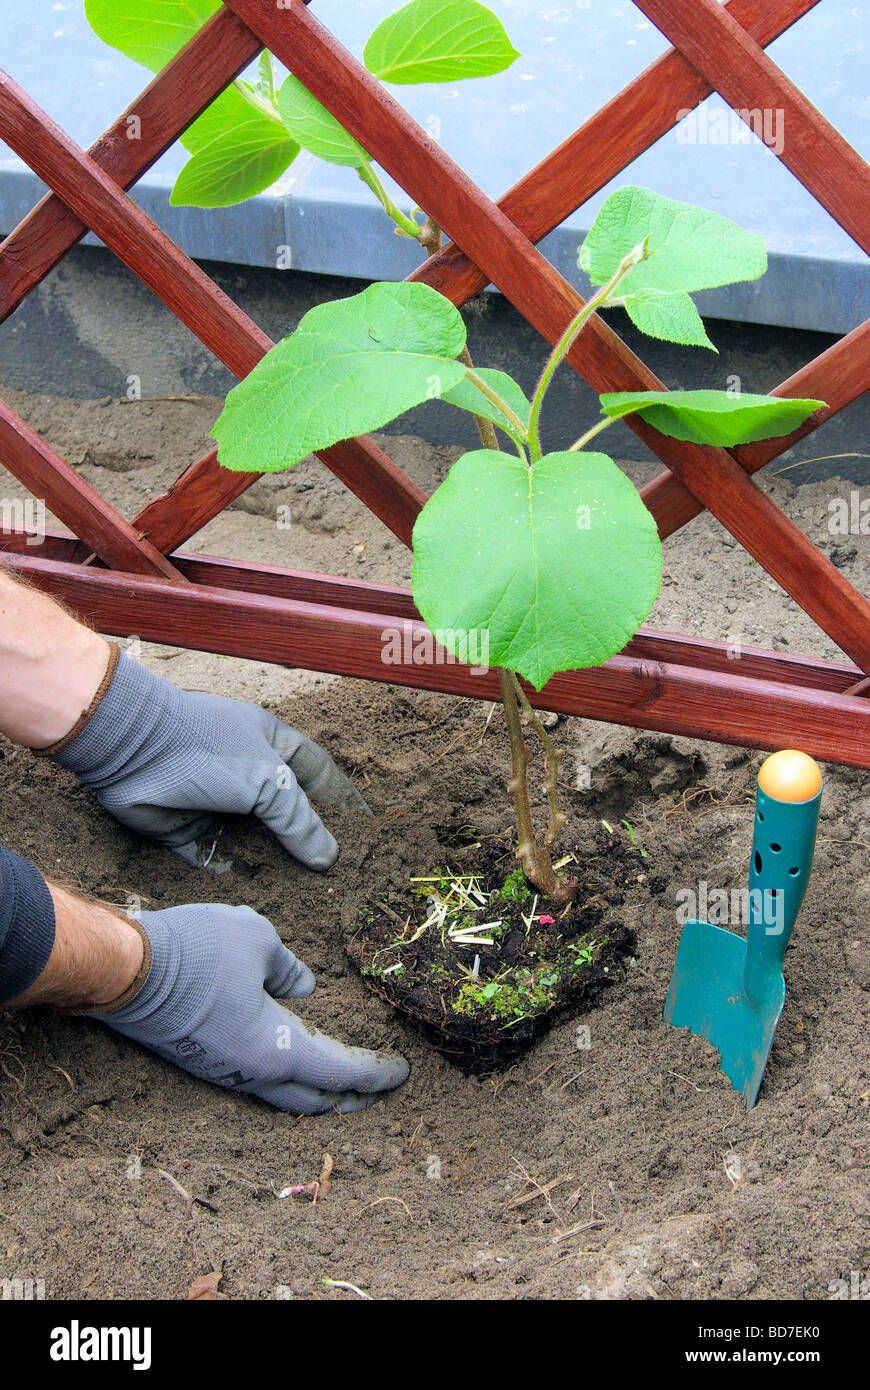 Kiwipflanze pflanzen planting a kiwi plant 04 - Stock Image